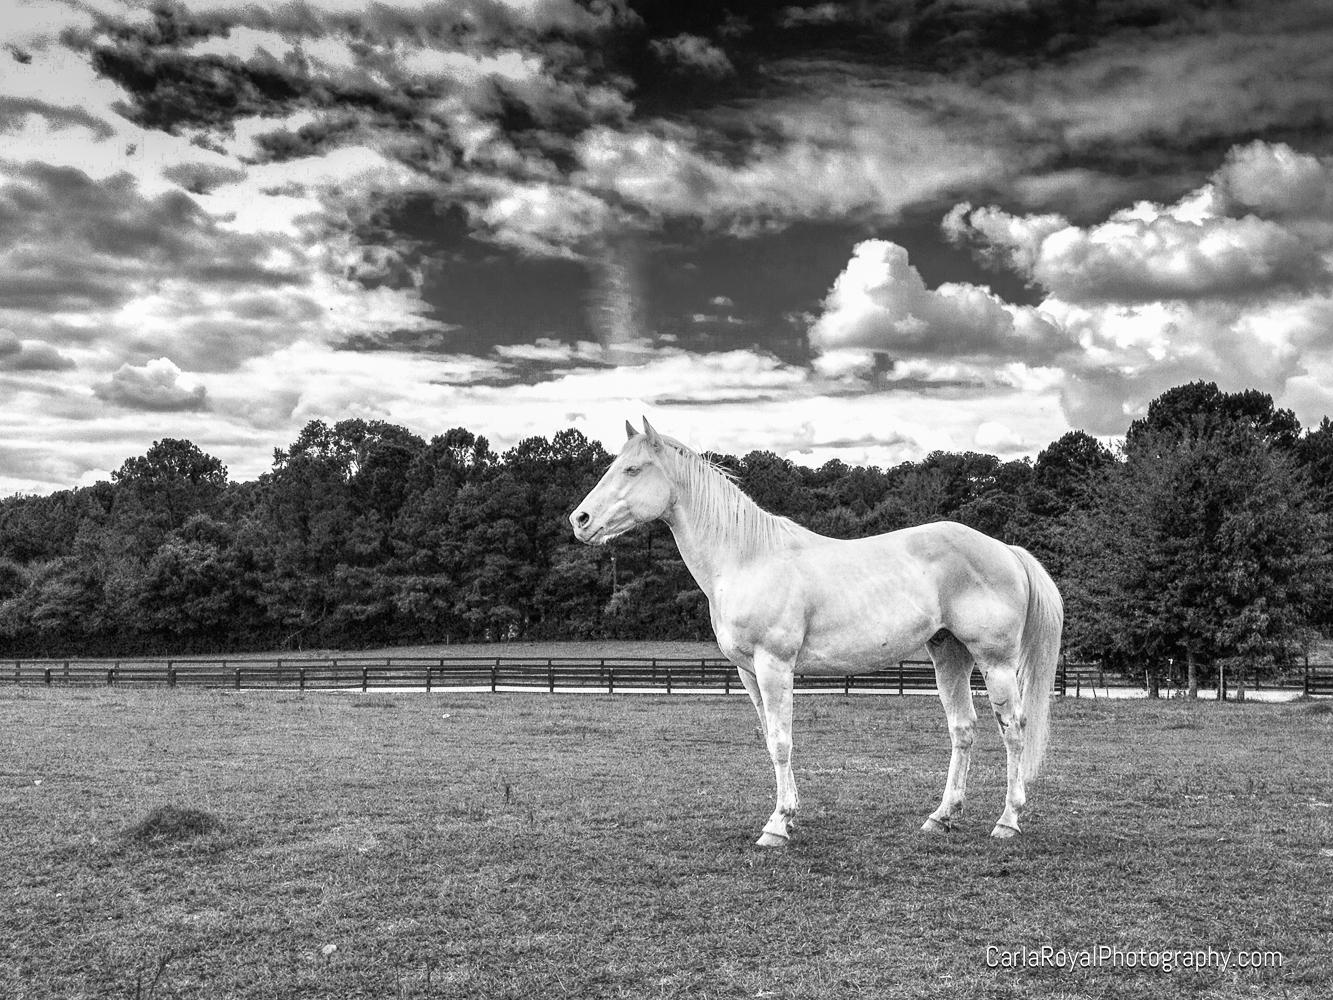 Tobe. My sister's horse!